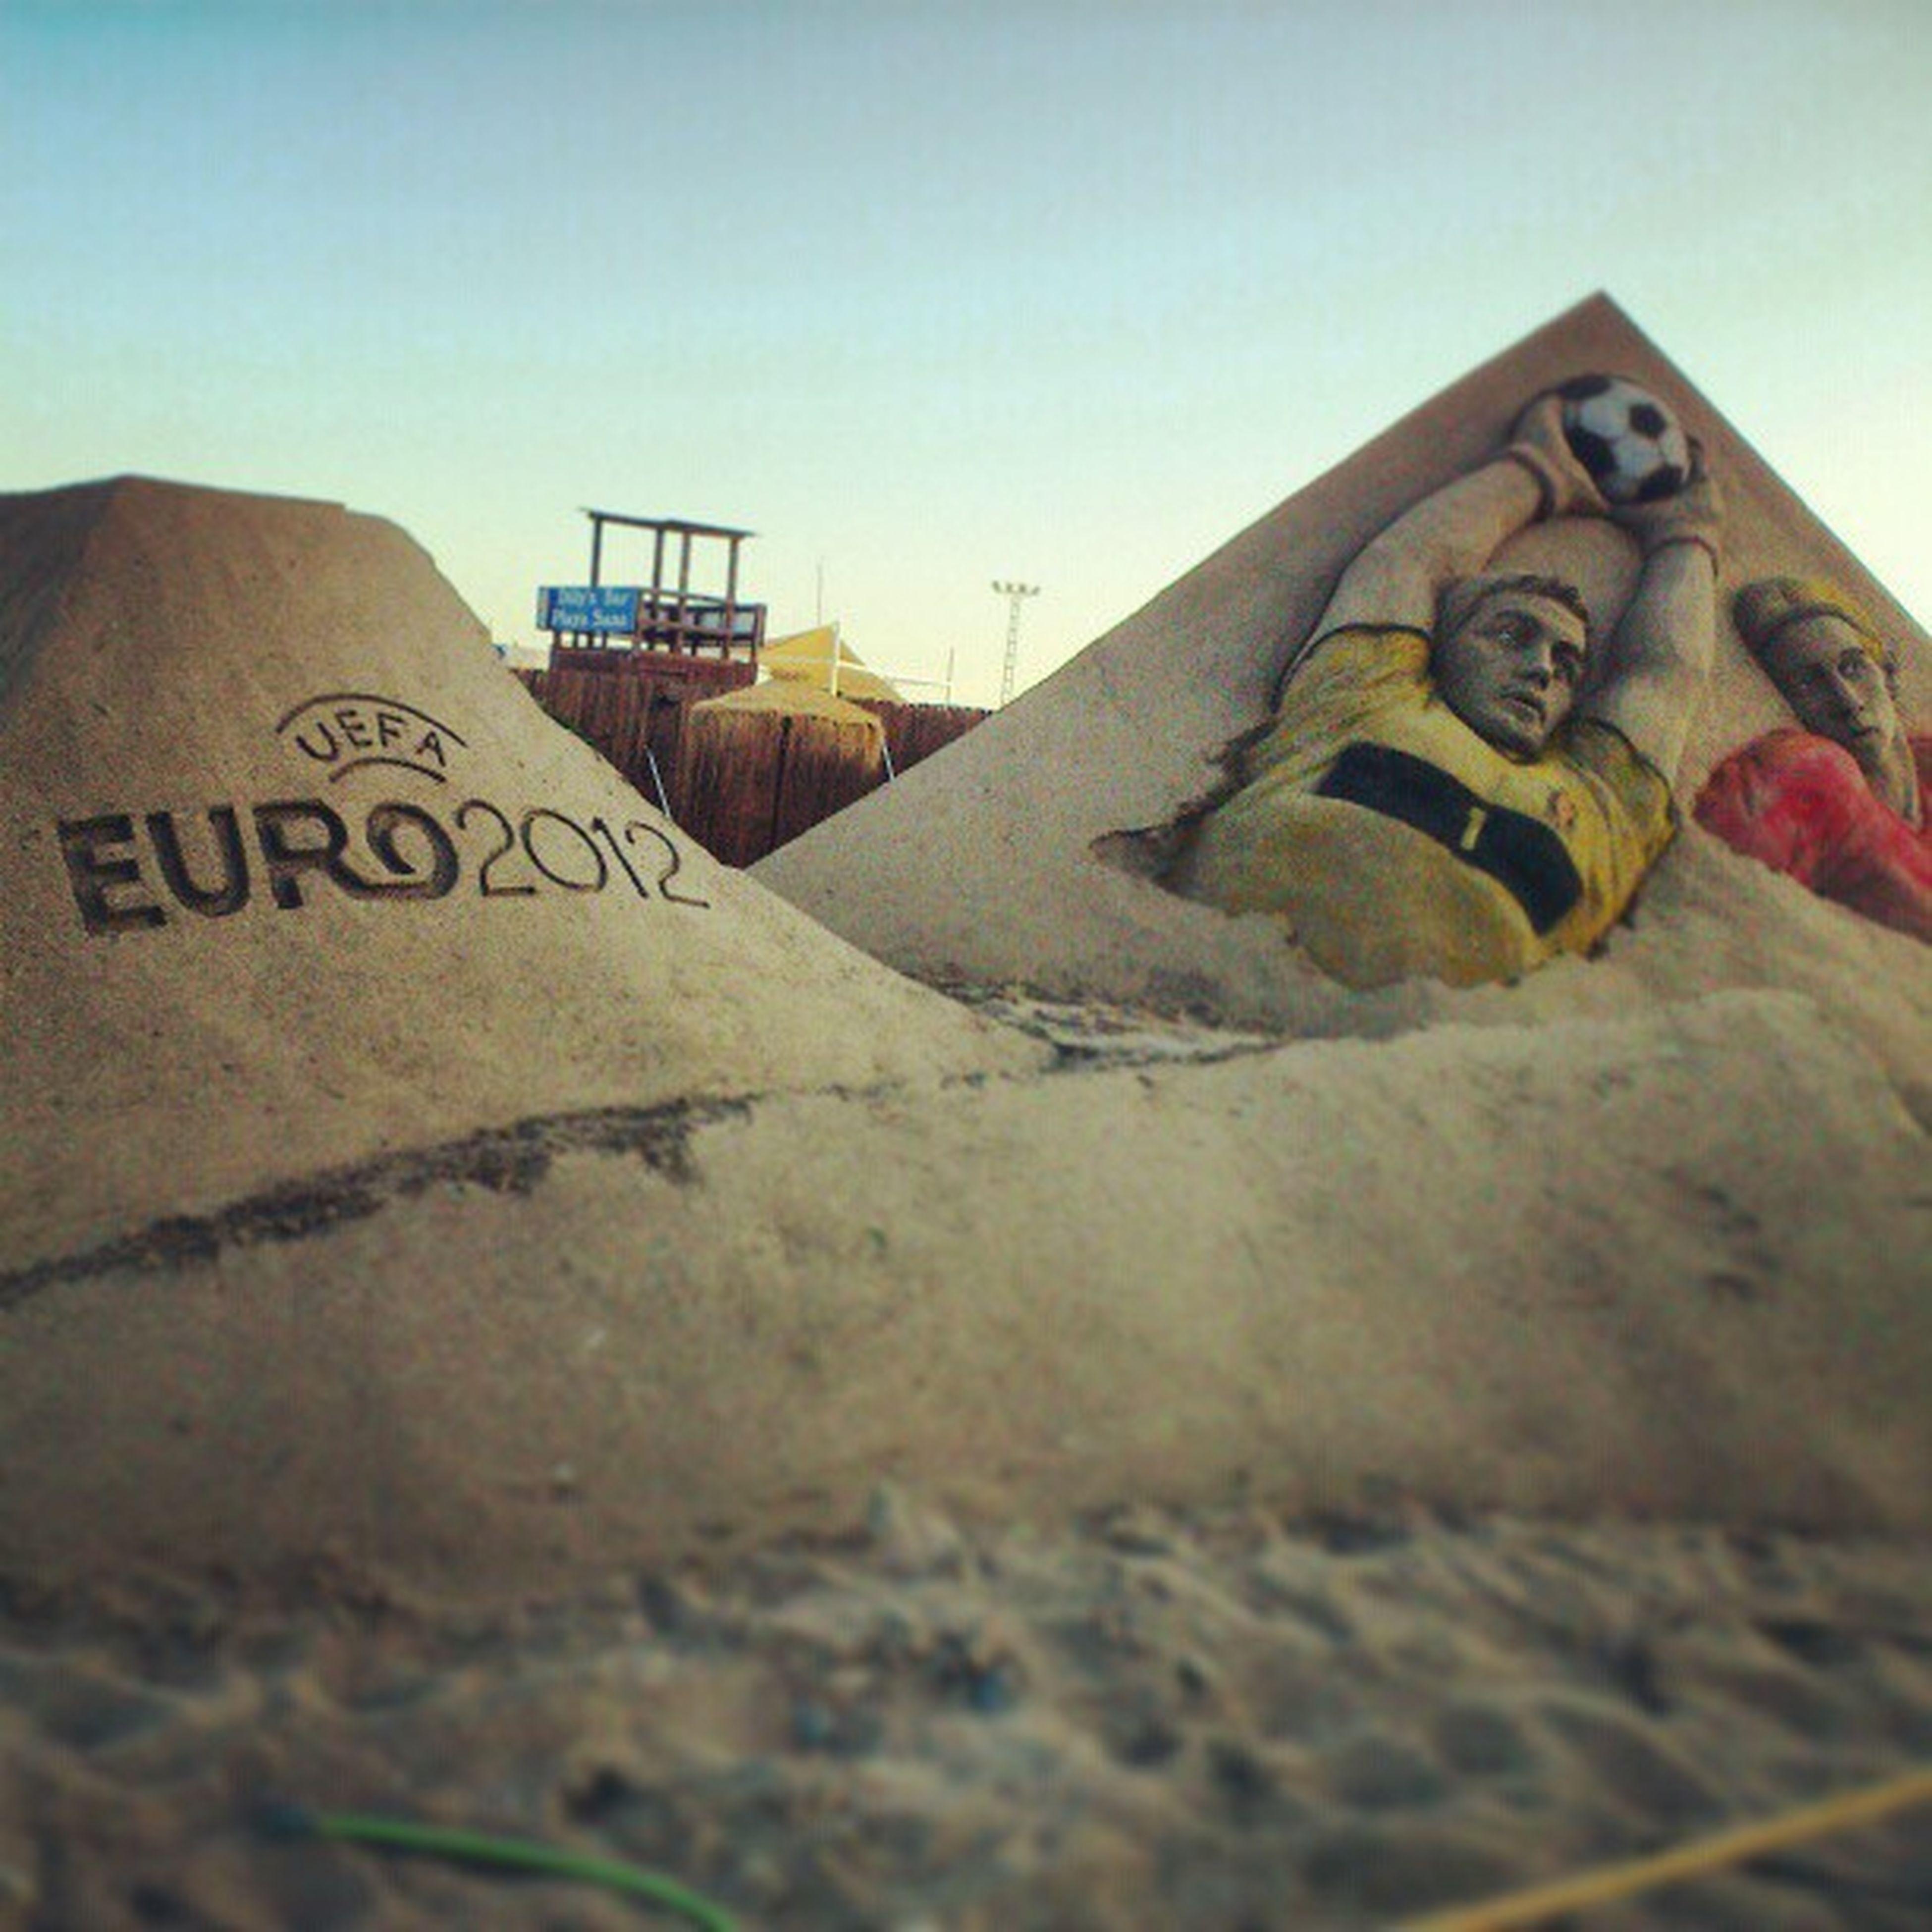 UFEA Euro 2012 Sand sculpture , the joy of a country red passion , la alegria de un país roja pasión , by pavel mylnikov and bagrat stepanyan , done at the grand_sand grandsand playa_de_levante marbella spain